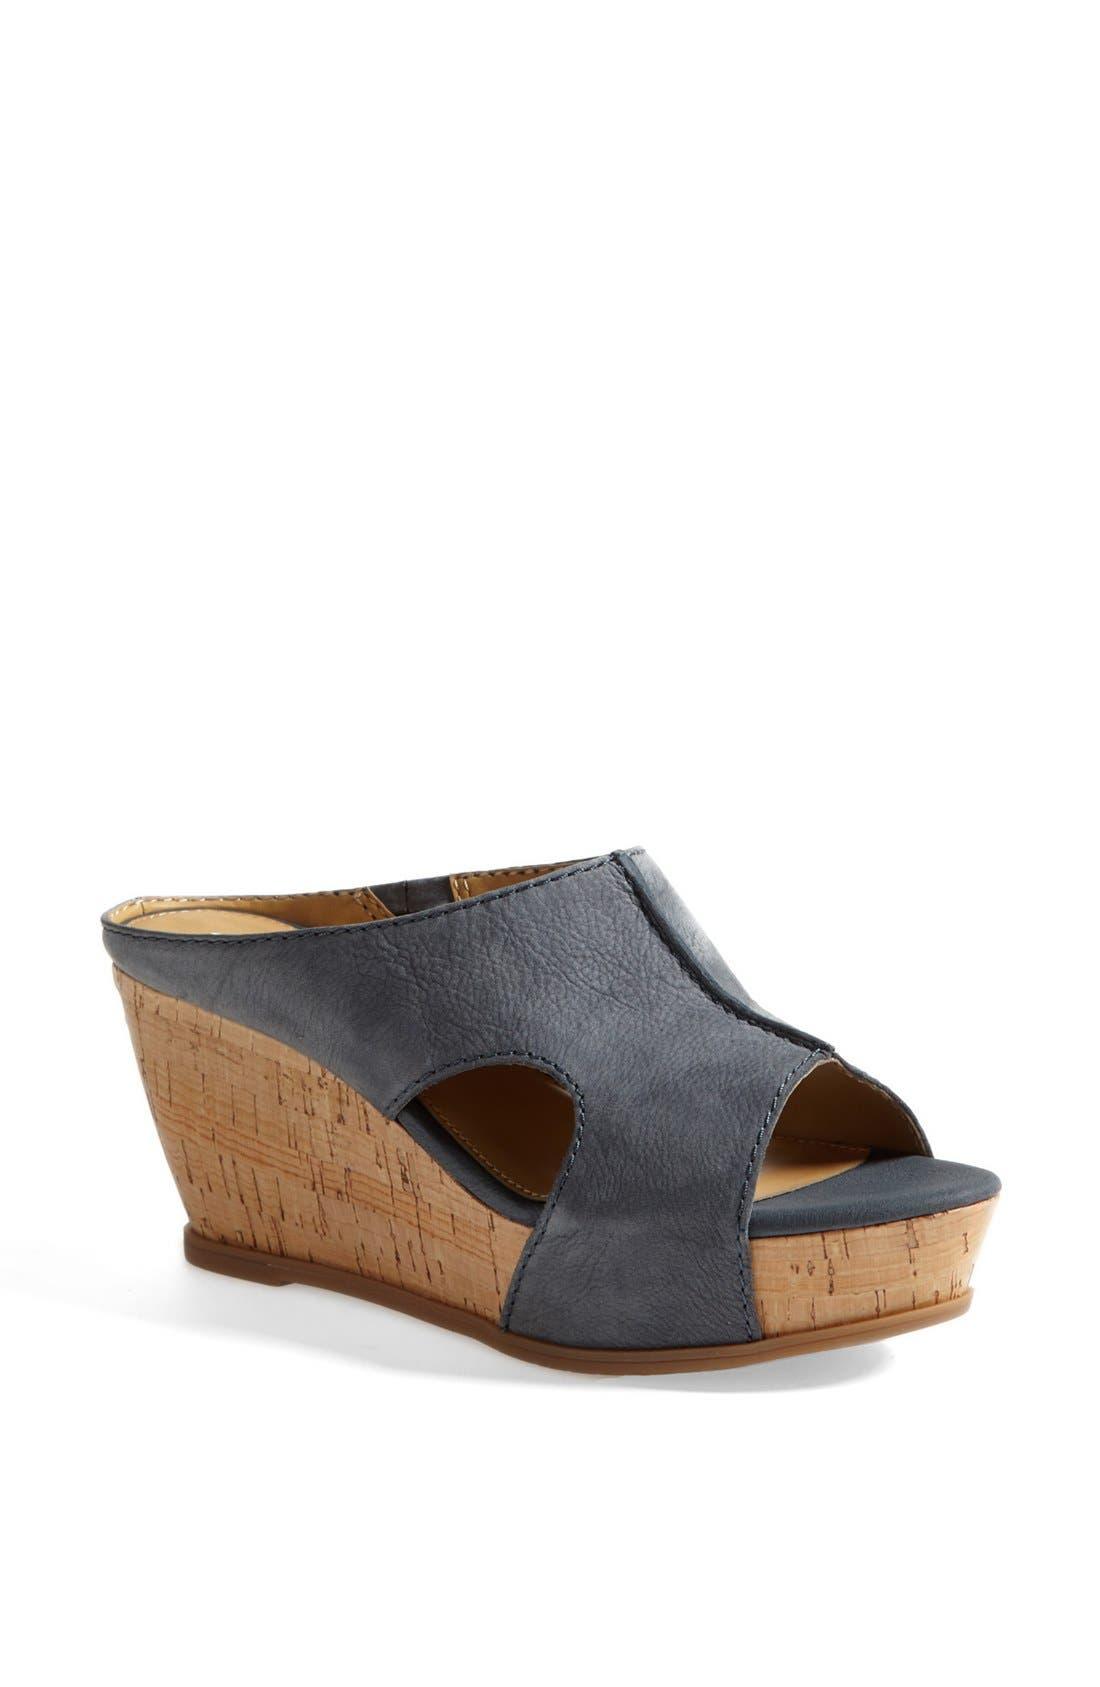 Main Image - Franco Sarto 'Fiora' Sandal (Nordstrom Exclusive)